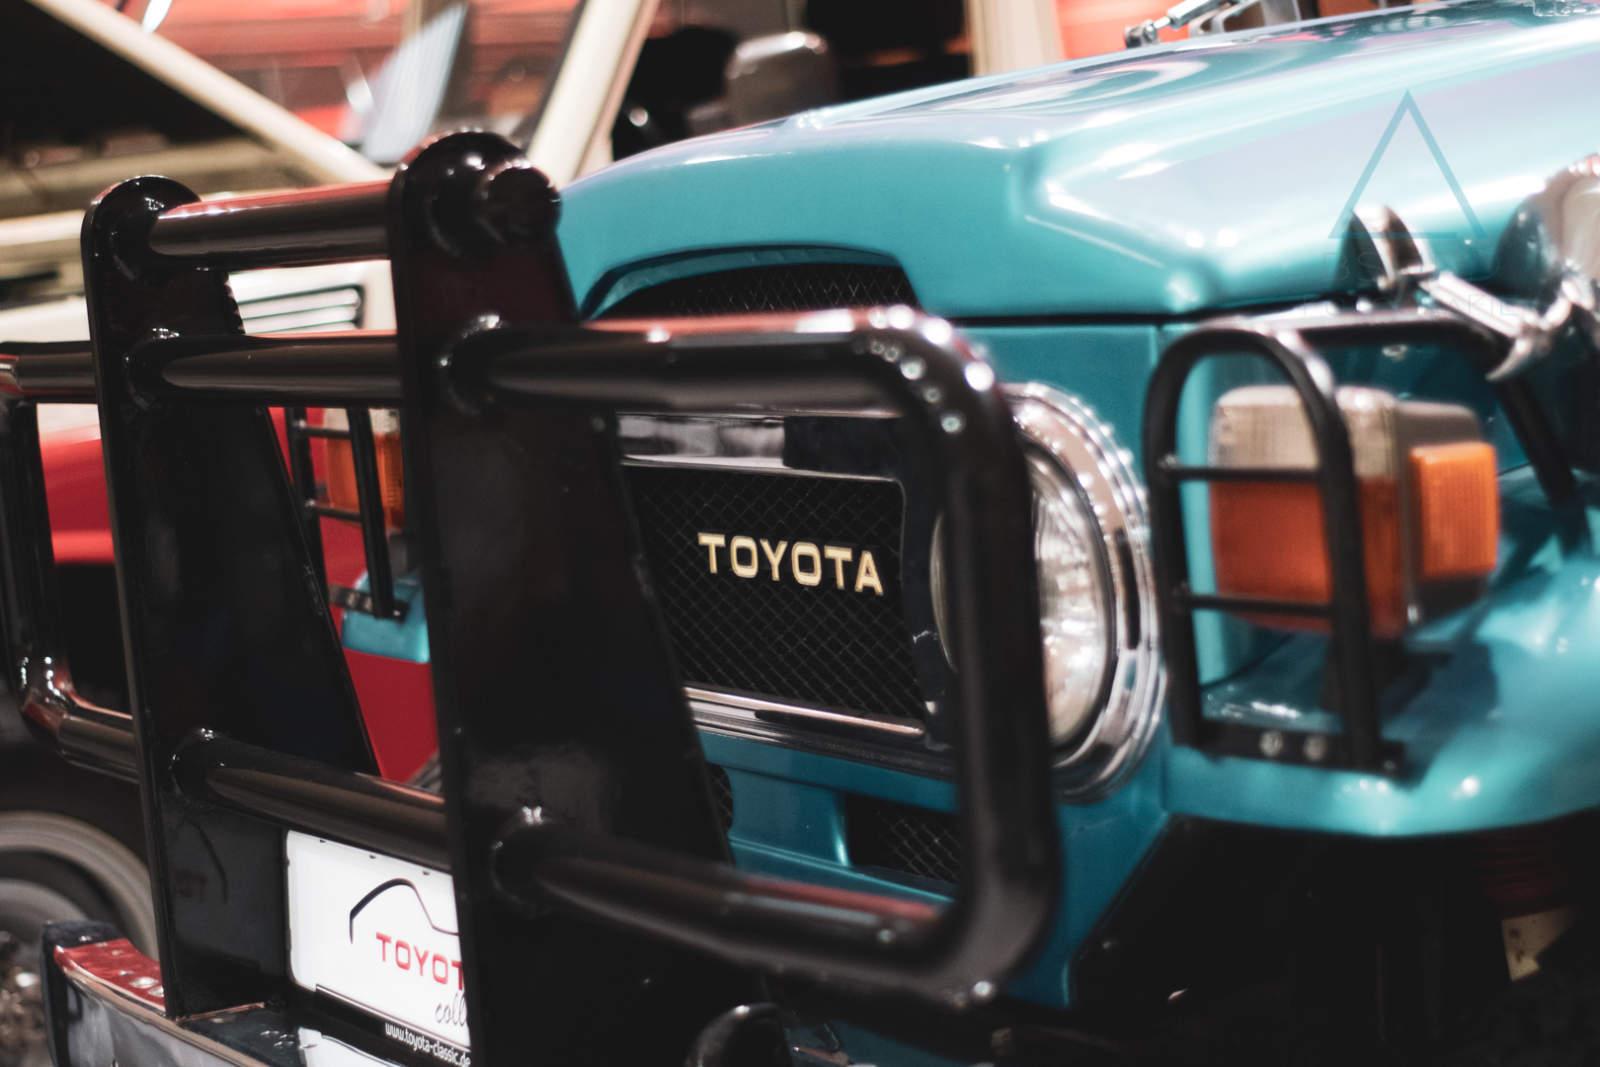 2019-01-05-Toyota-Collection-Koeln - DSC01701-edit-52.jpg